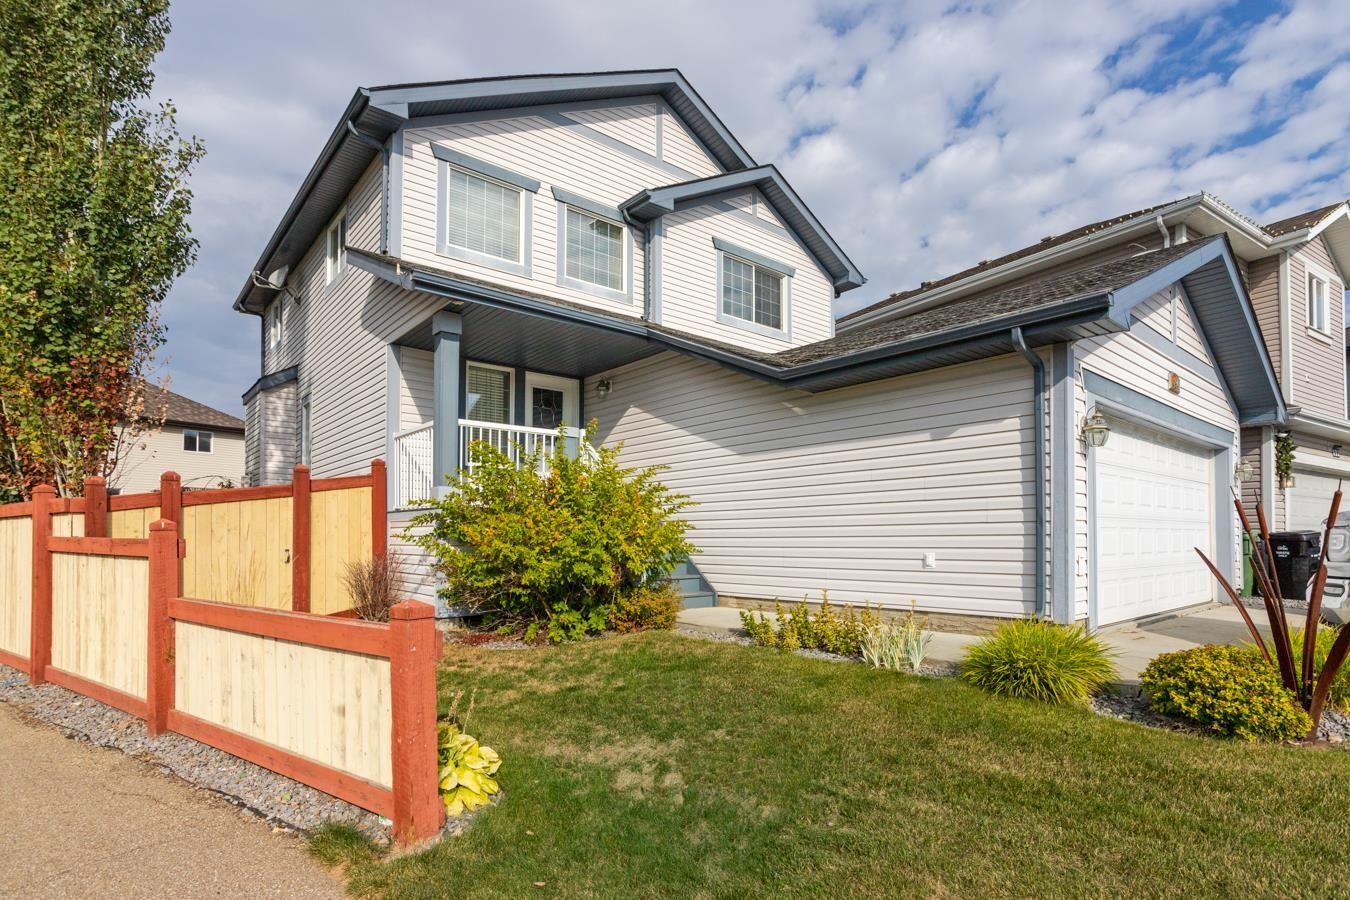 Main Photo: 134 SOUTHFORK Drive: Leduc House for sale : MLS®# E4262309